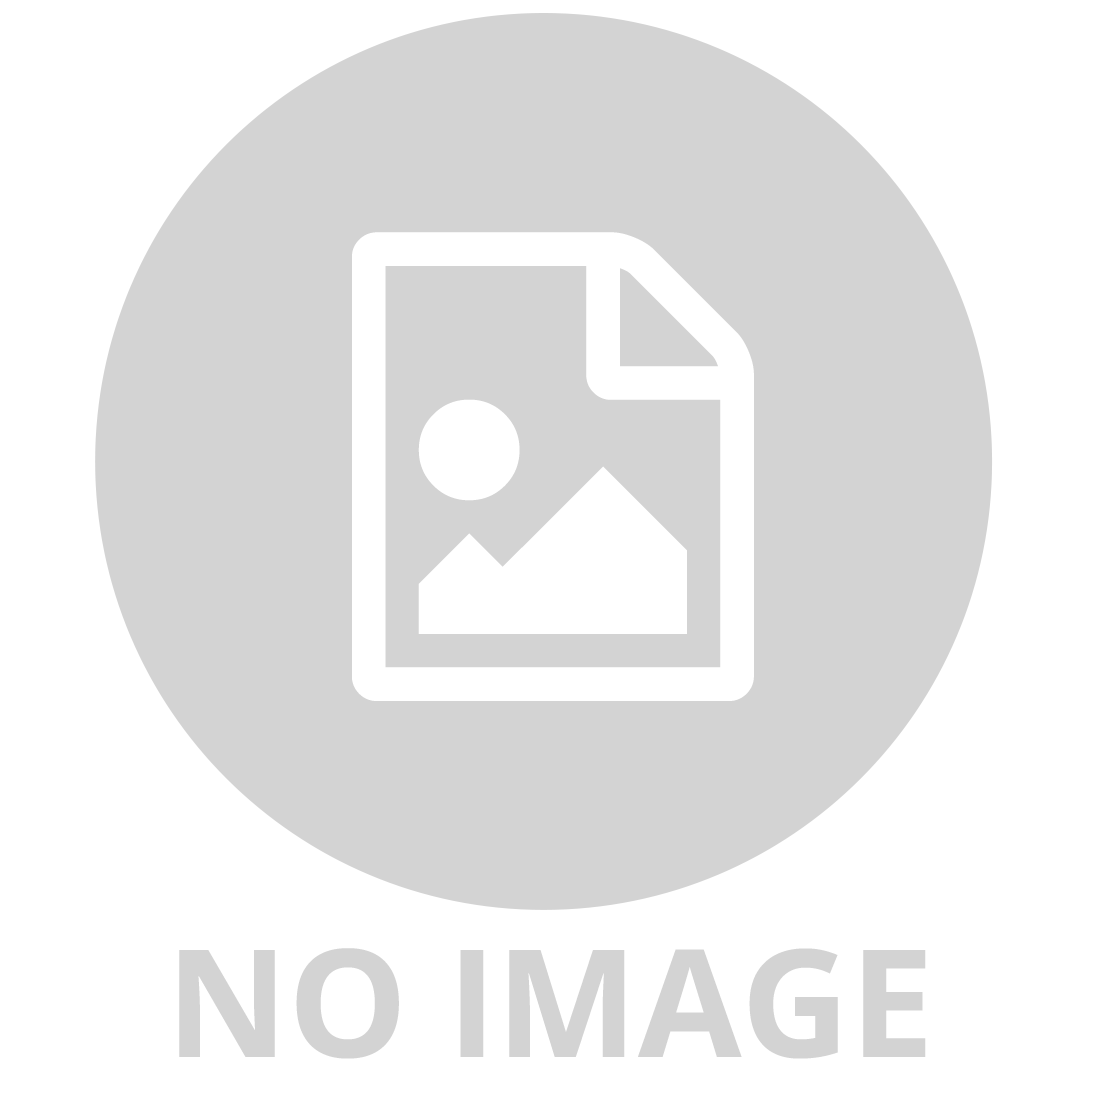 LEGO JURASSIC WORLD 75942 VELOCIRAPTOR BIPLANE RESCUE MISSION